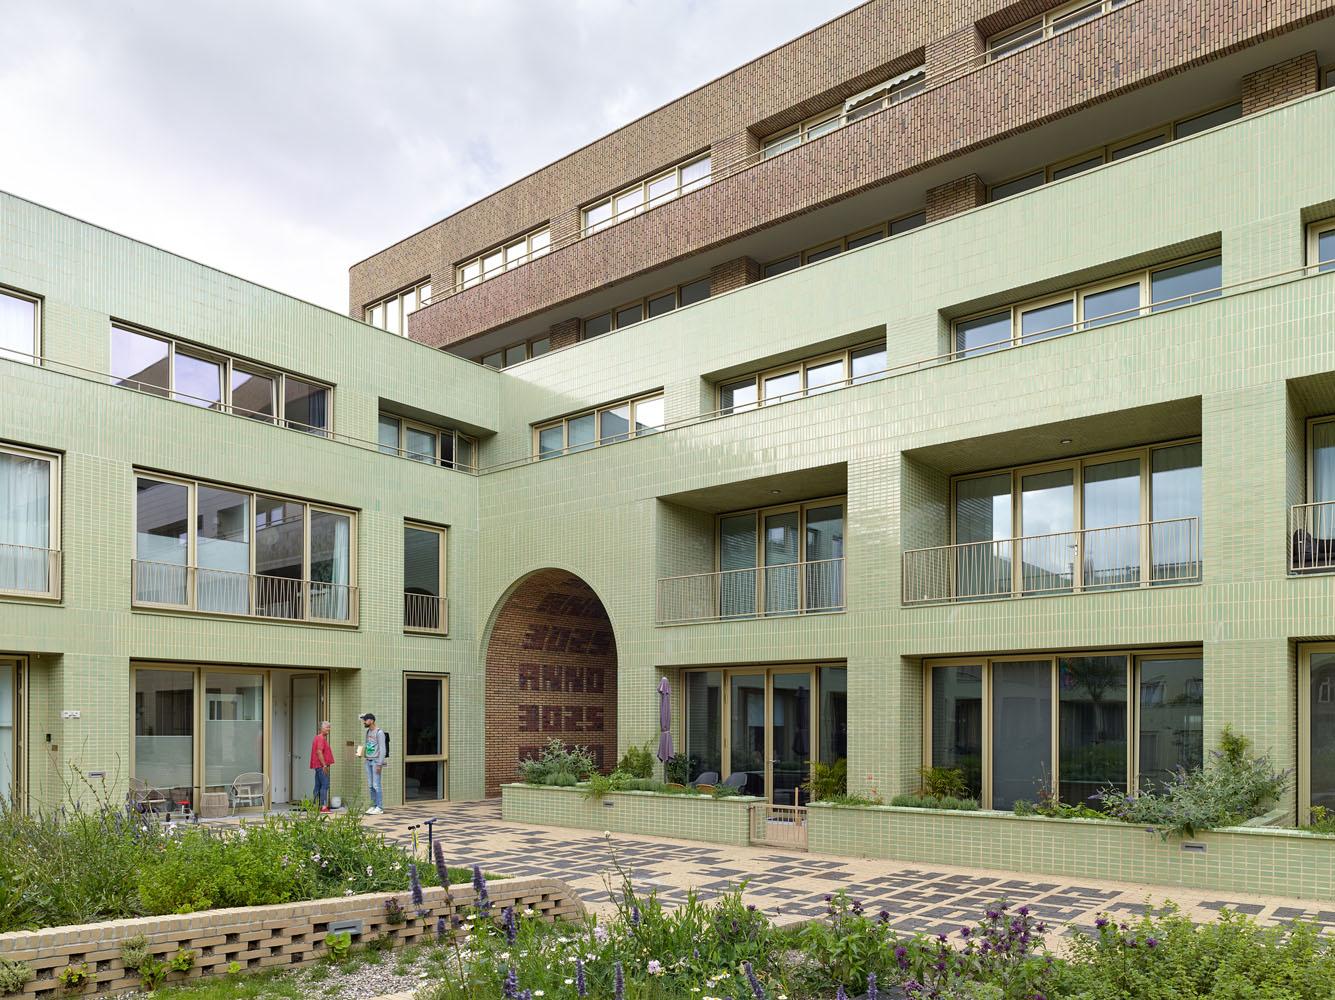 green glazed brick lines the courtyard facade